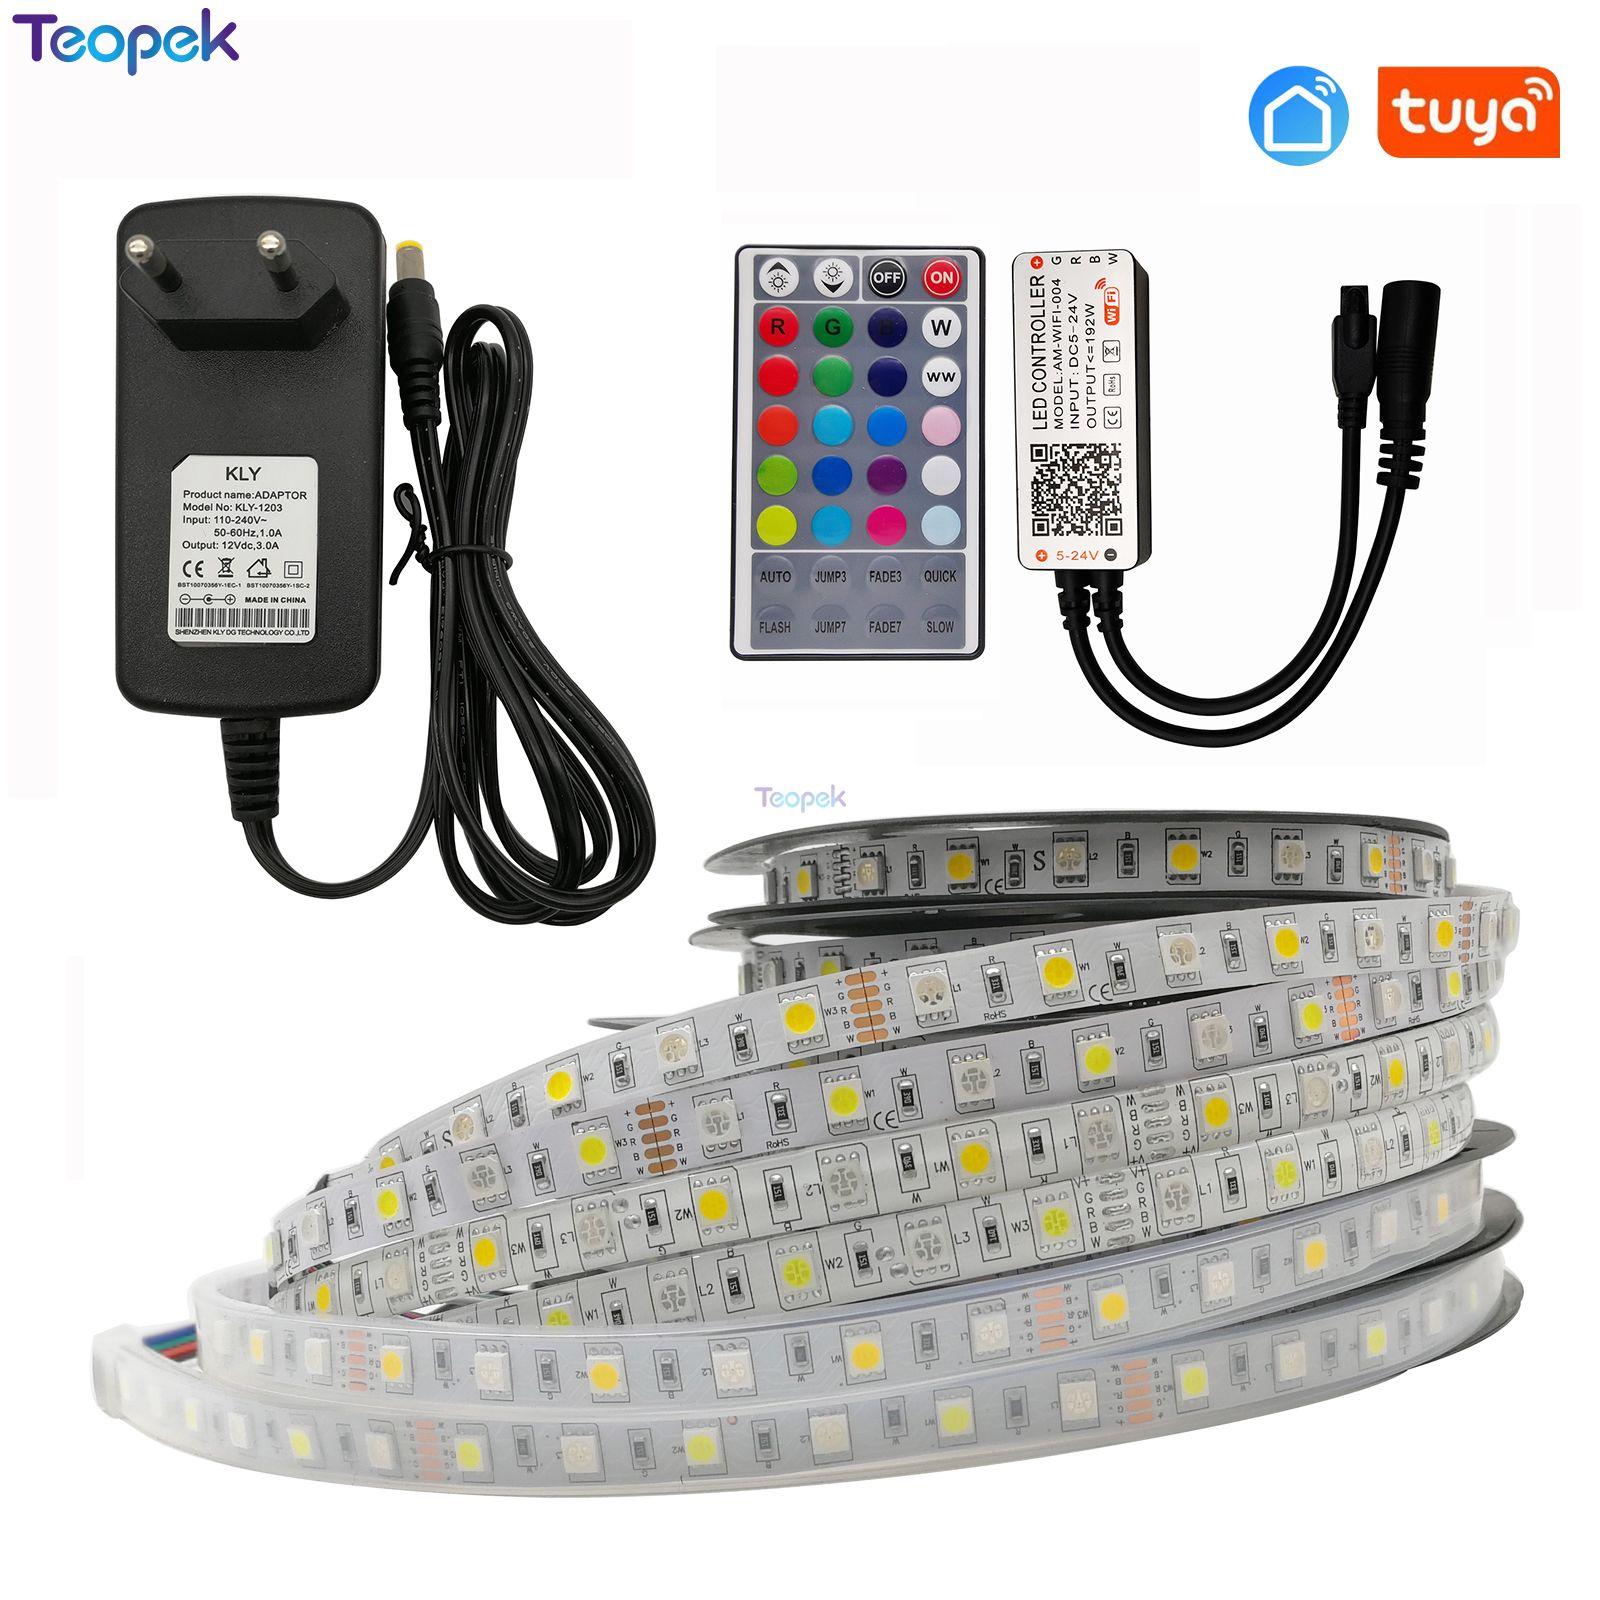 Tuya RGBW LED Strip Set 5050 60led/M RGBW LED Tape DC12V IP30/IP65/IP67+ Smart Life Wifi Controller + Power Adapter